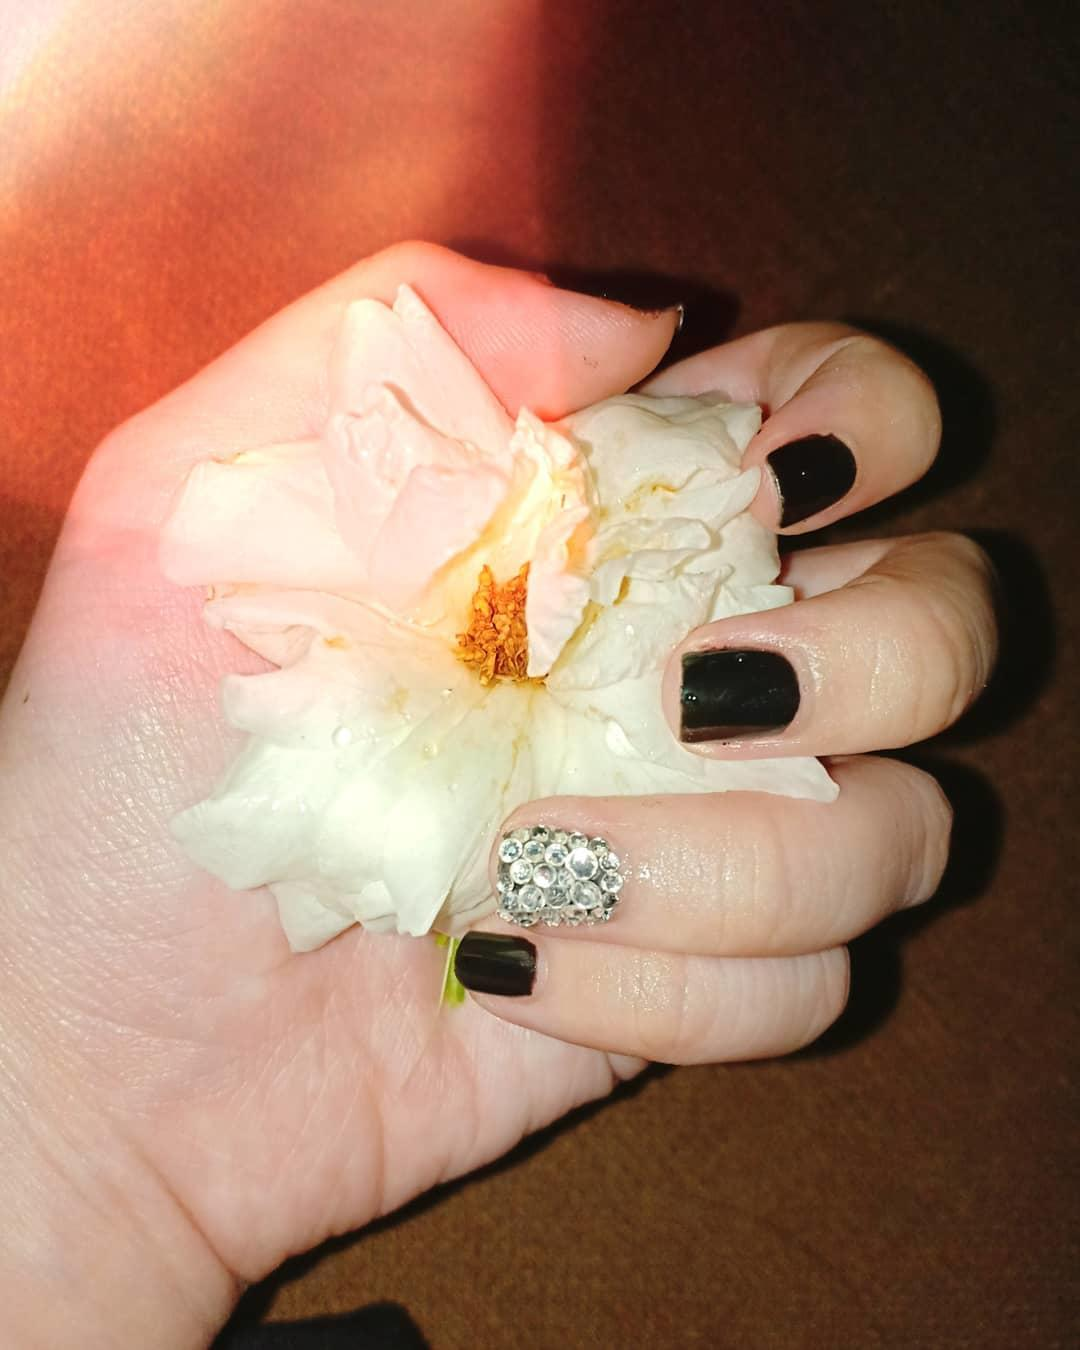 simple flower nail design ideas 2019 4 - 24 Simple Flower Nail Design Ideas 2019